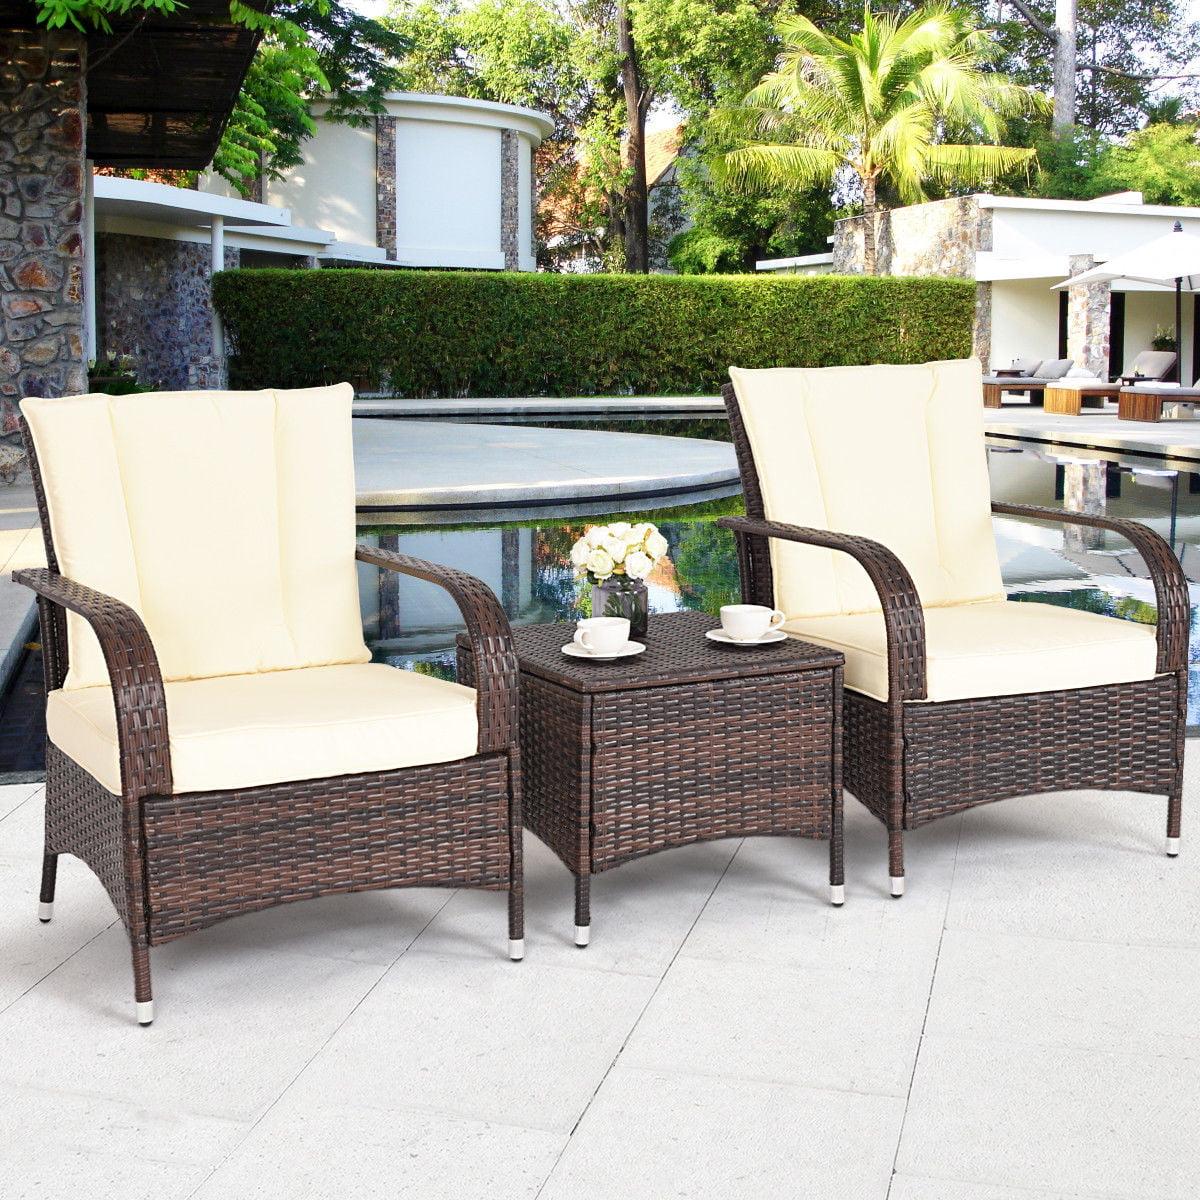 Costway 3pcs outdoor patio mix brown rattan wicker furniture set seat cushioned beige walmart com